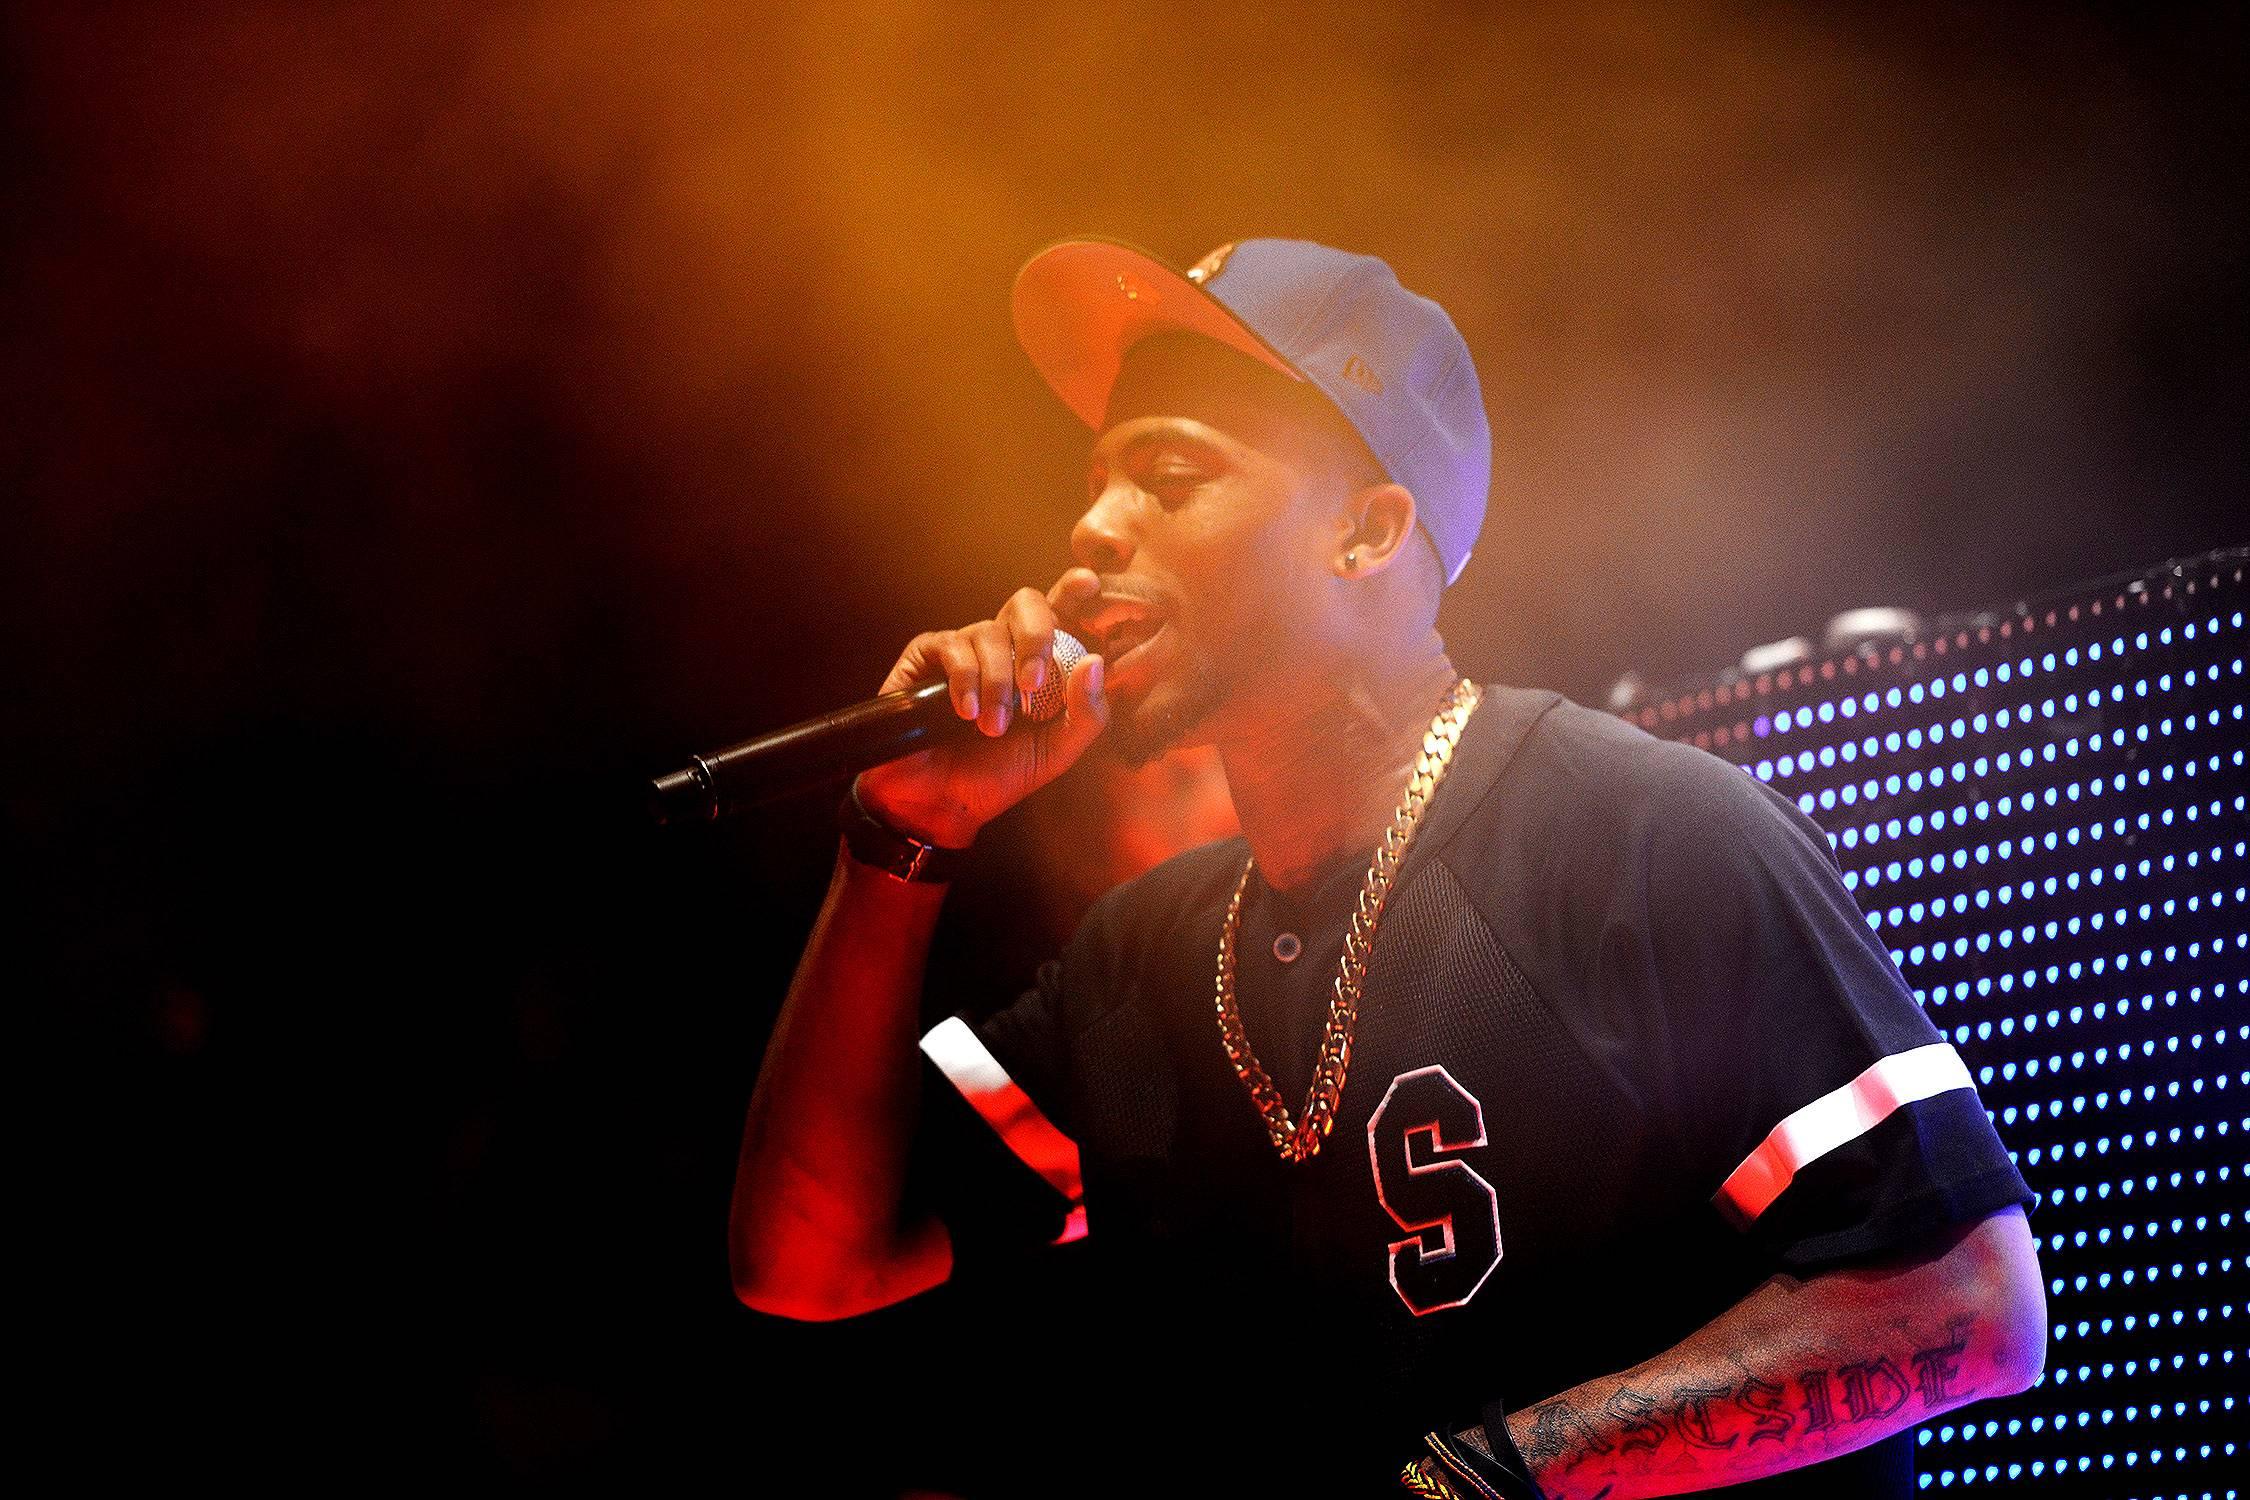 B.o.B - Your favorite Atlanta rapper was really born in Winston-Salem, North Carolina.  (Photo: Daniel Boczarski/Getty Images for MLB.com)